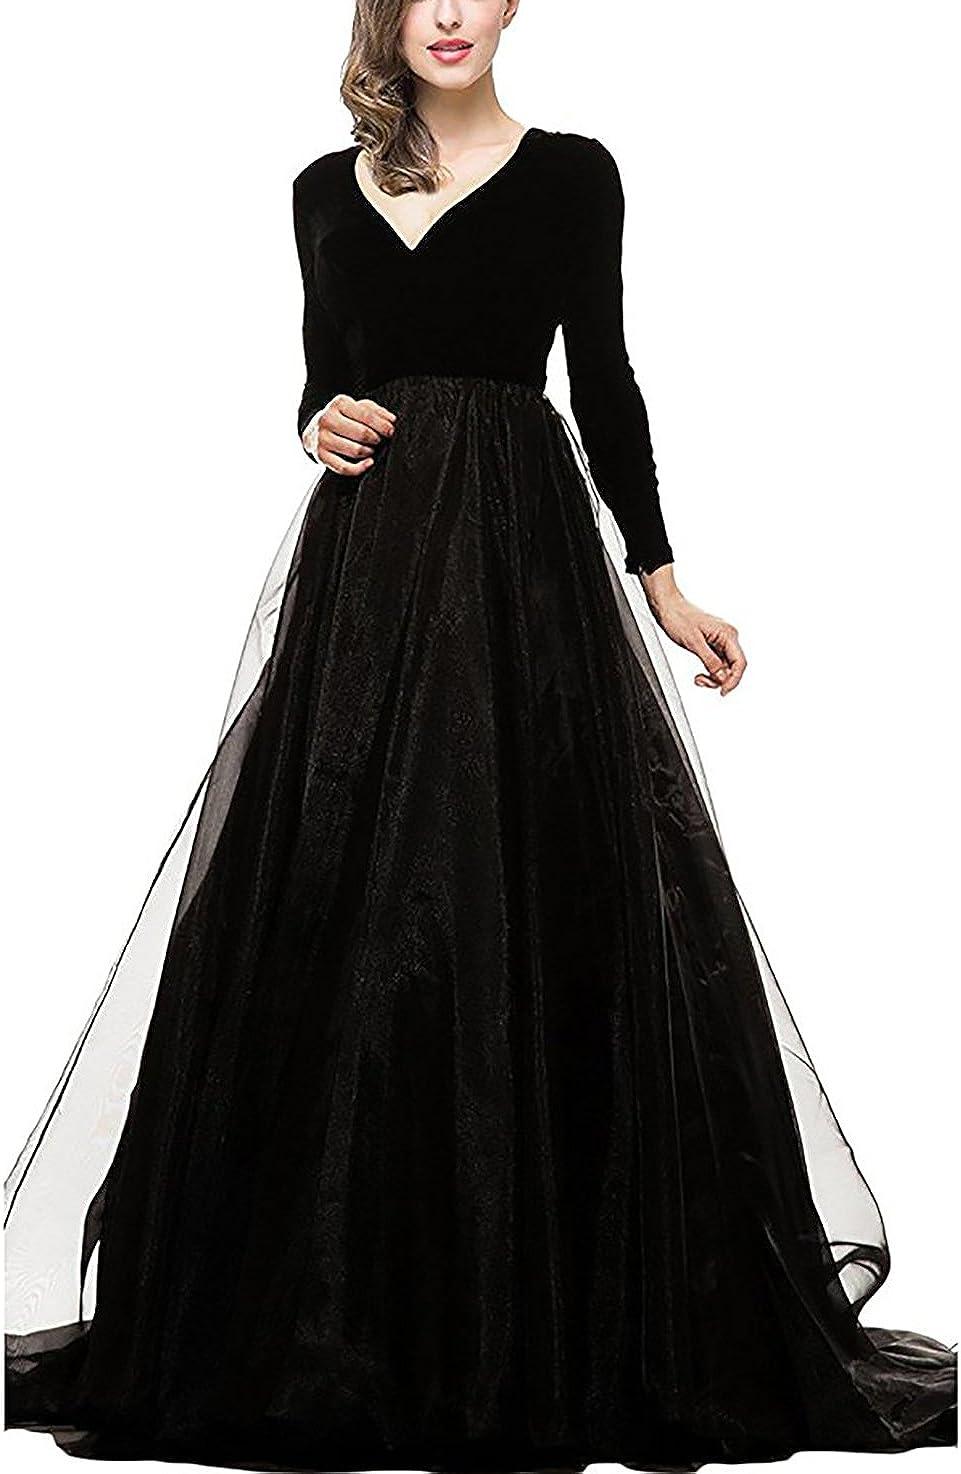 DarlingU Women's Long Sleeve service Prom San Jose Mall Evening Maxi B Dresses Pockets